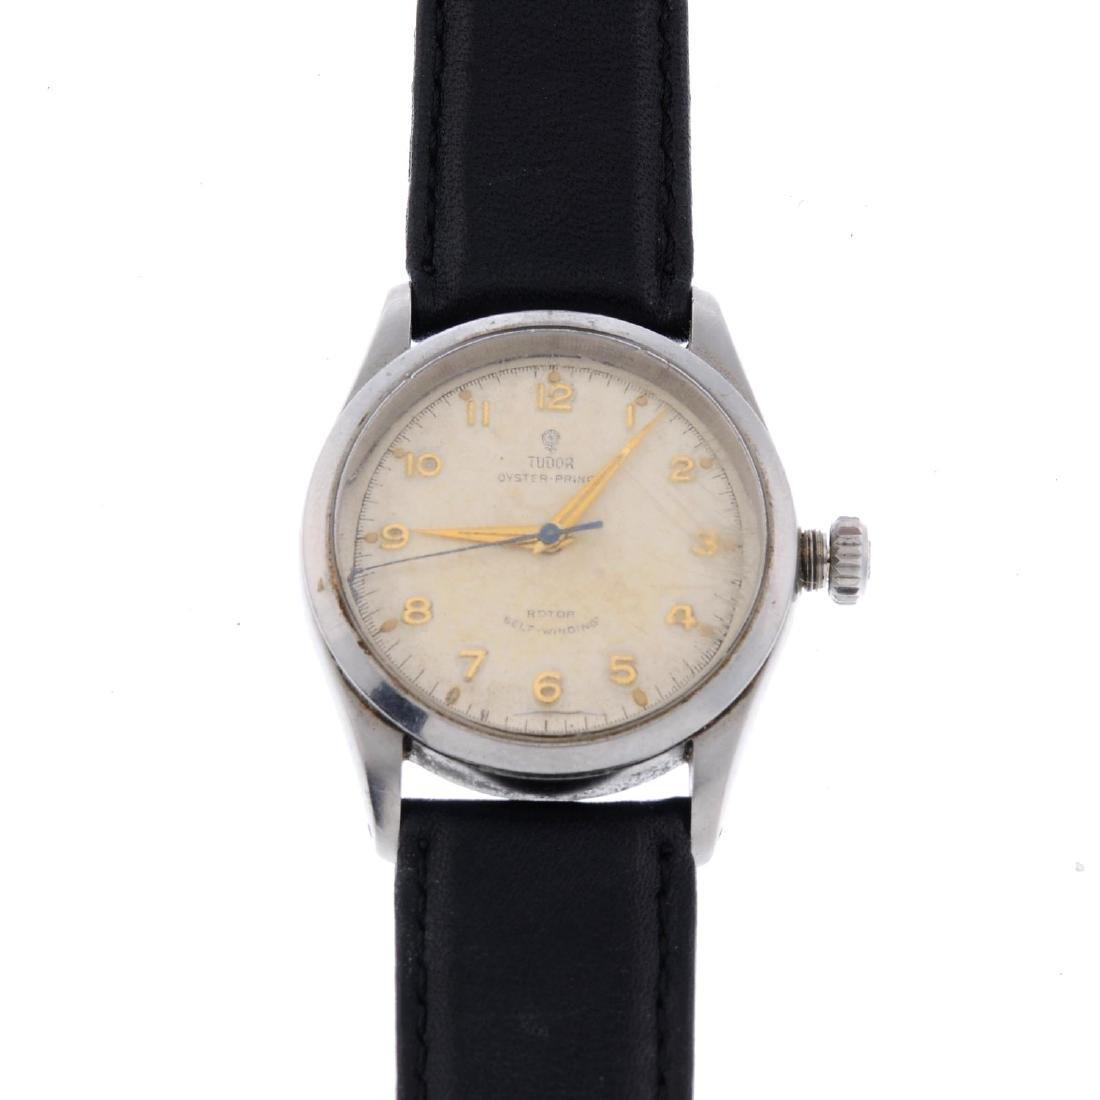 TUDOR - a gentleman's Oyster Prince wrist watch.